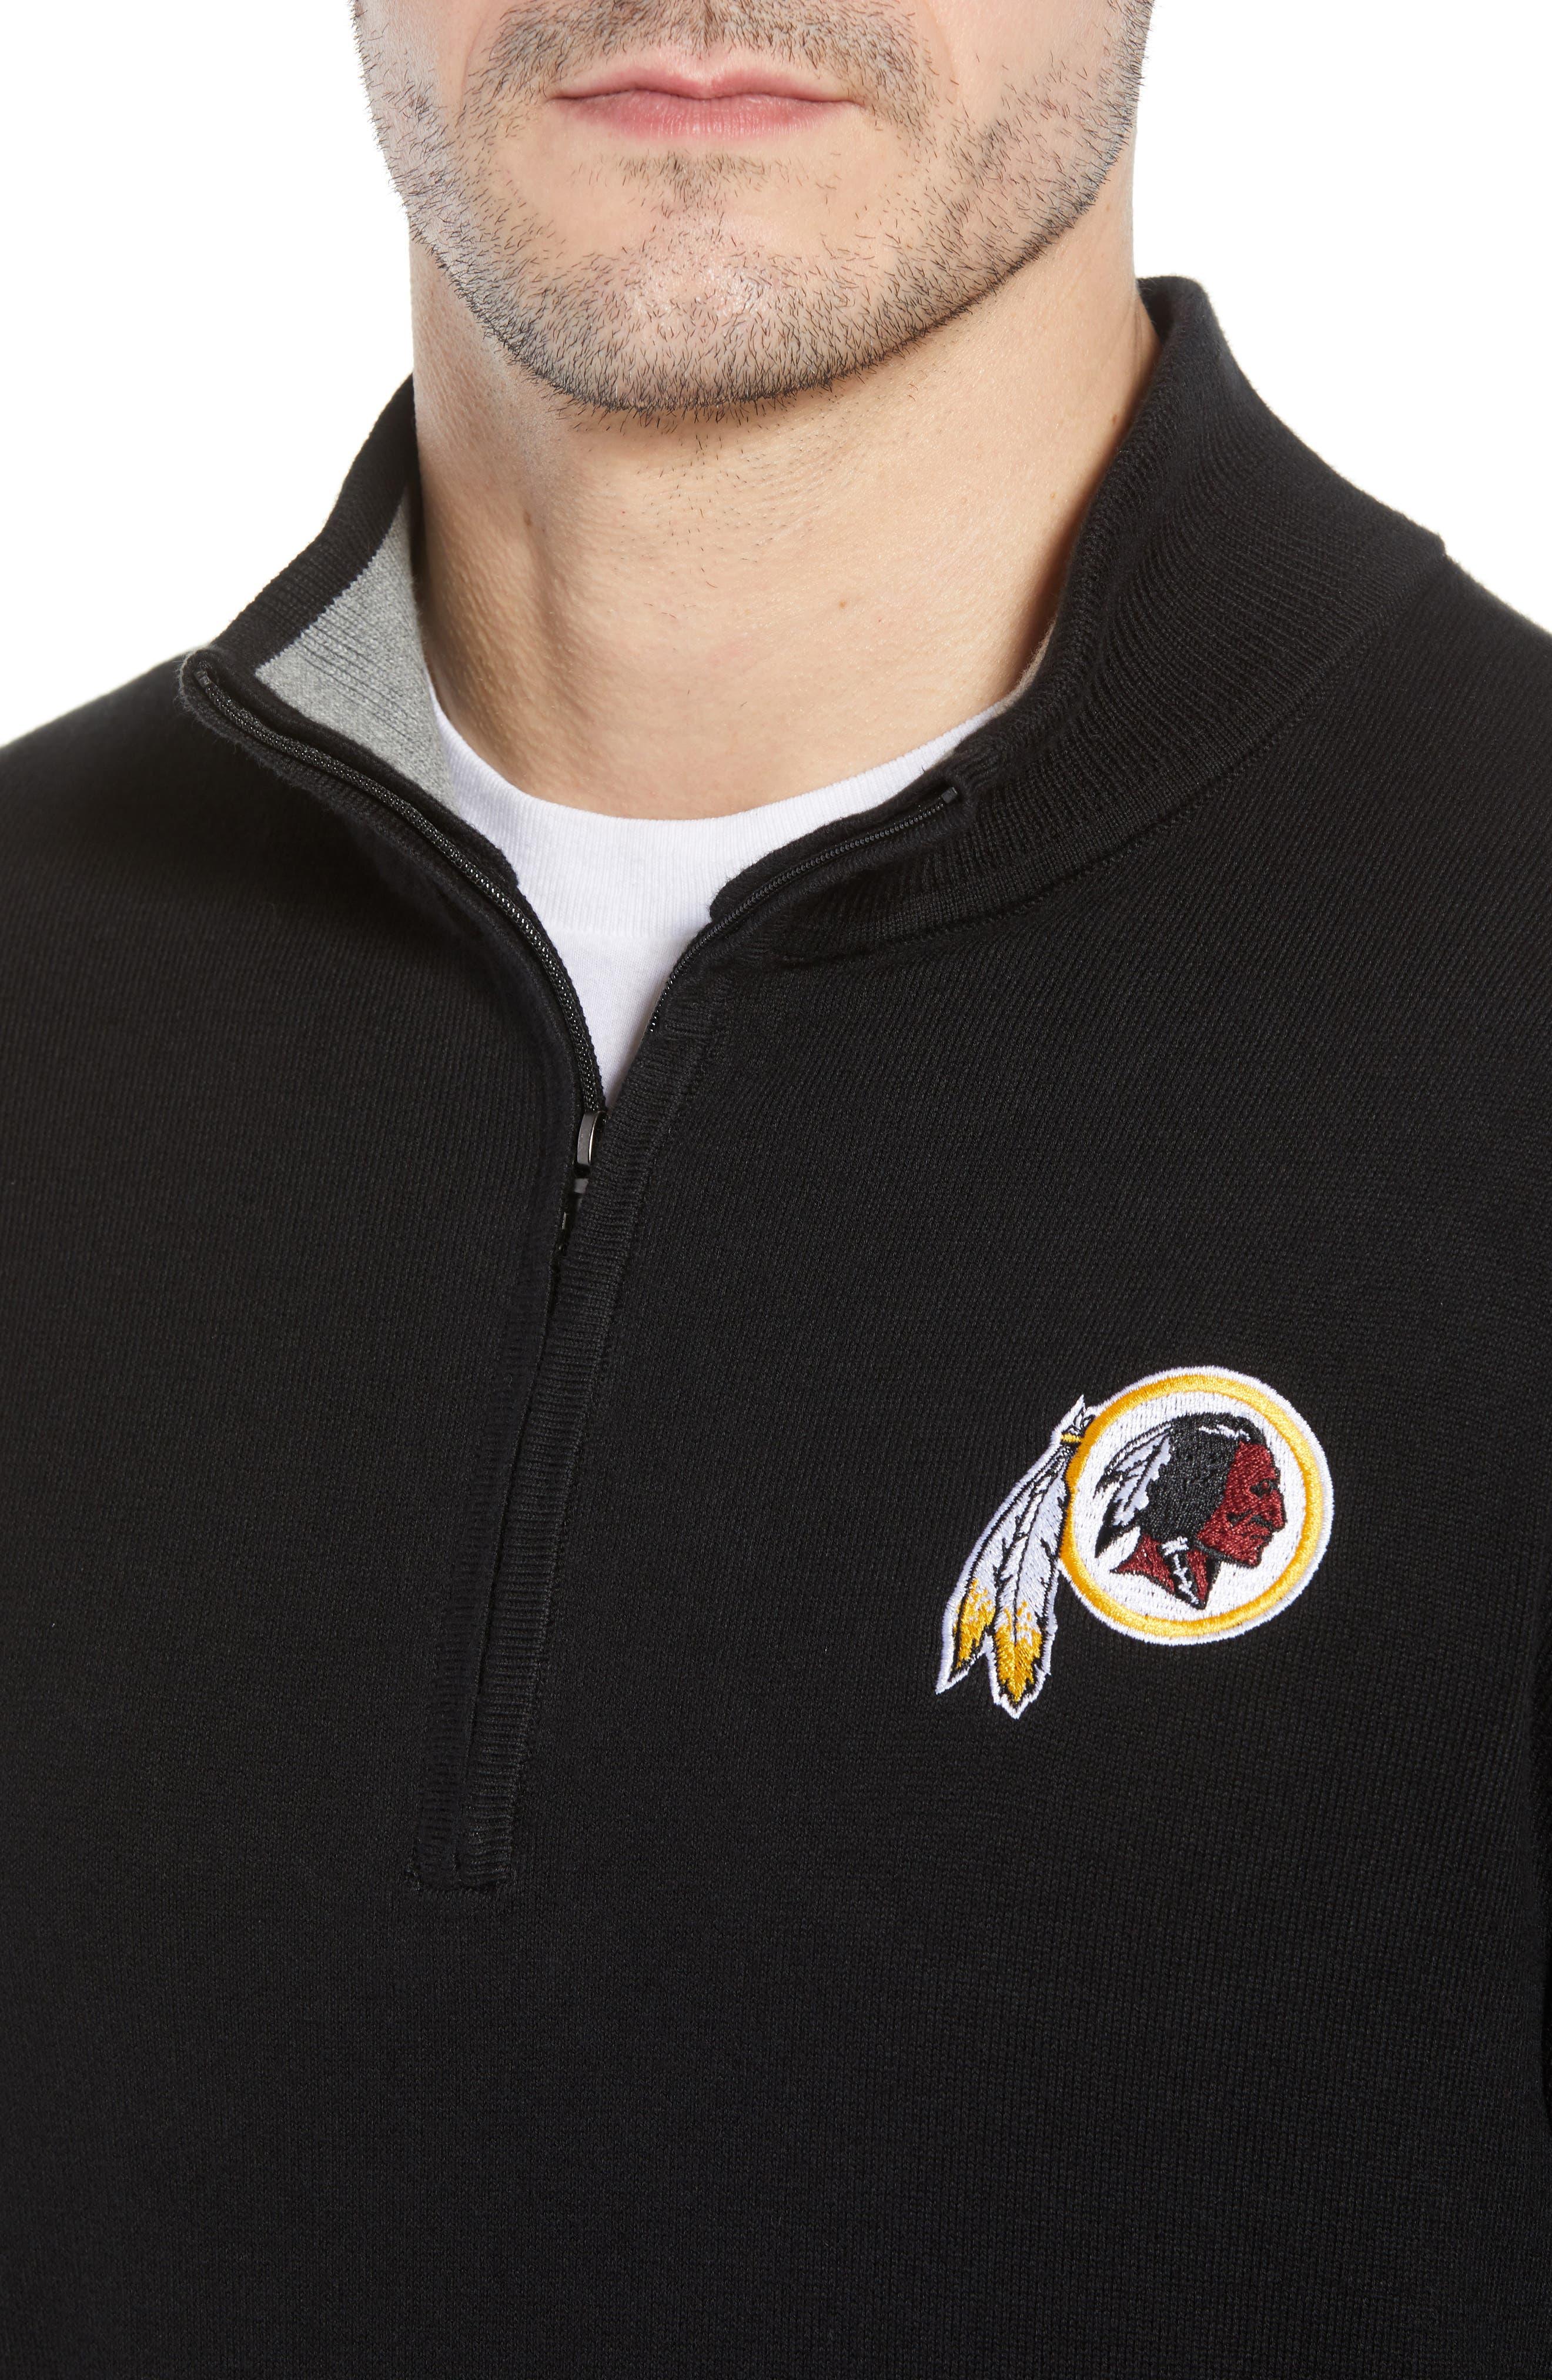 Washington - Lakemont Regular Fit Quarter Zip Sweater,                             Alternate thumbnail 4, color,                             BLACK